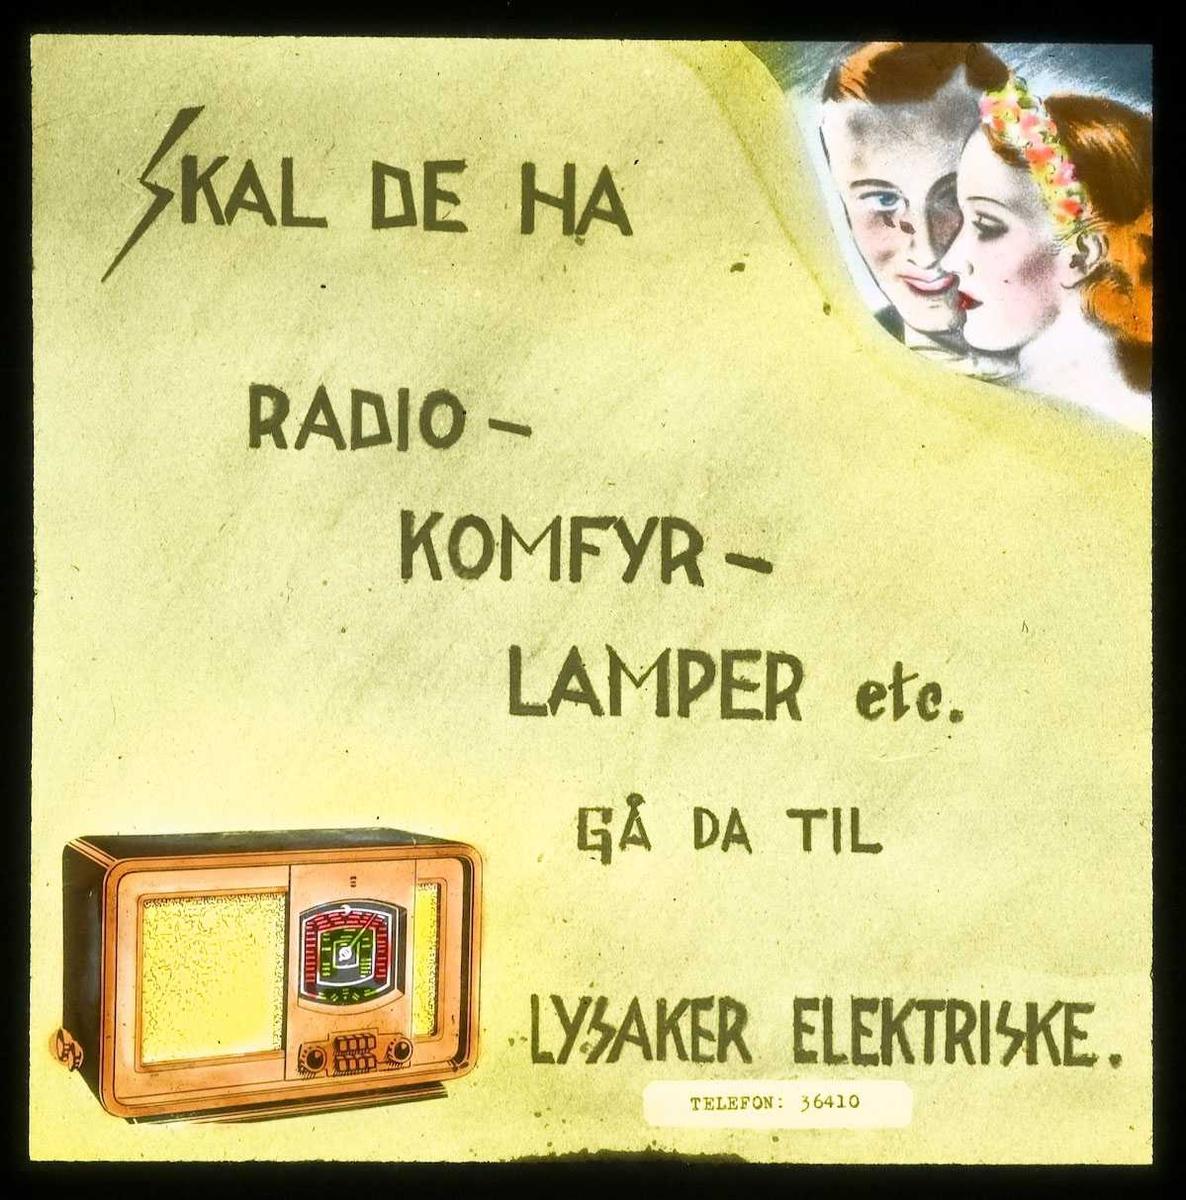 Kinoreklame fra Ski. Skal De ha radio, komfyr, lamper etc. gå da til Lysaker elektriske.